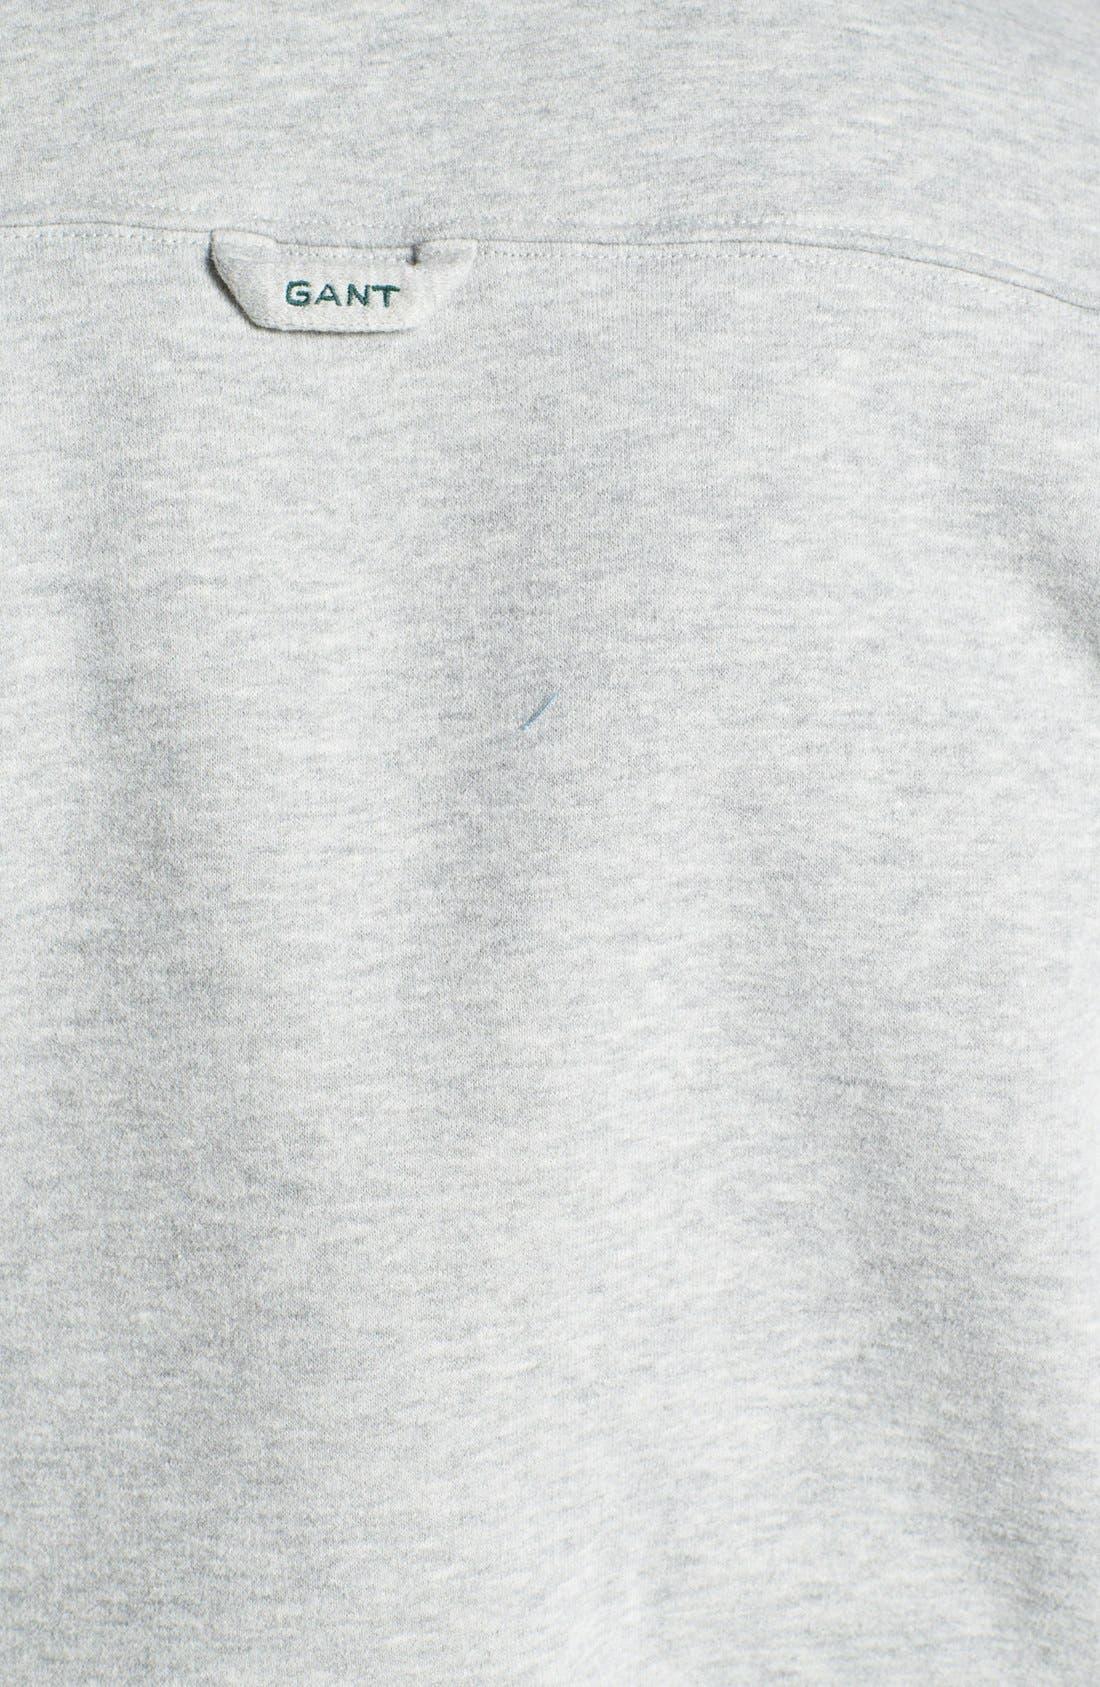 Alternate Image 3  - Gant by Michael Bastian Half-Zip Pullover Sweatshirt